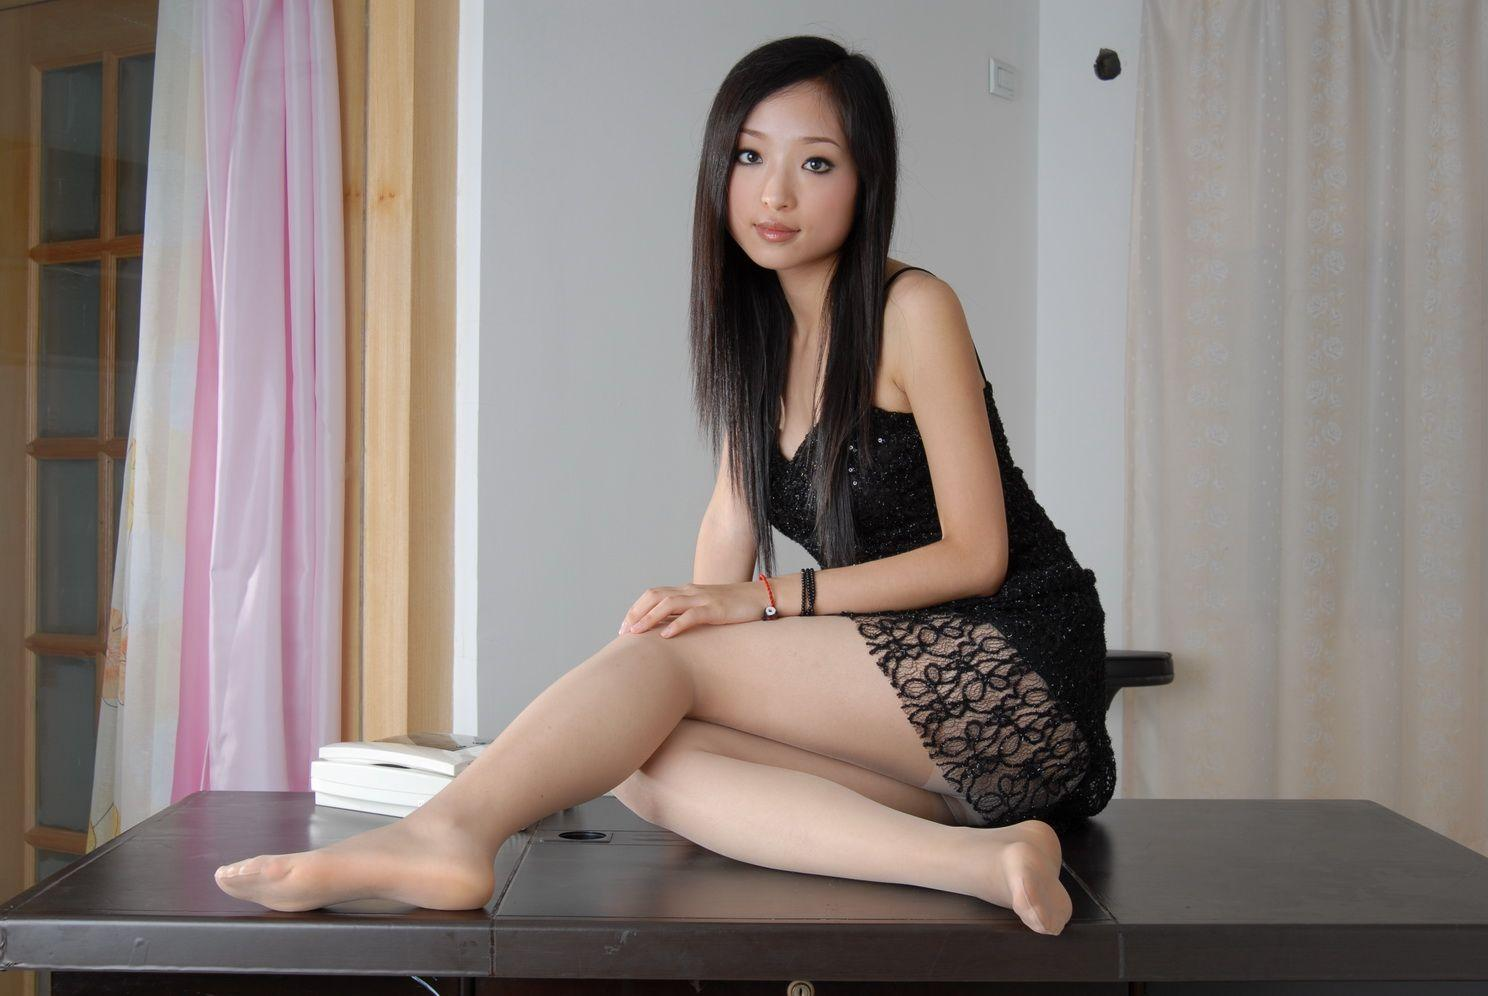 PAULETTE: Pretty asian model pantyhose